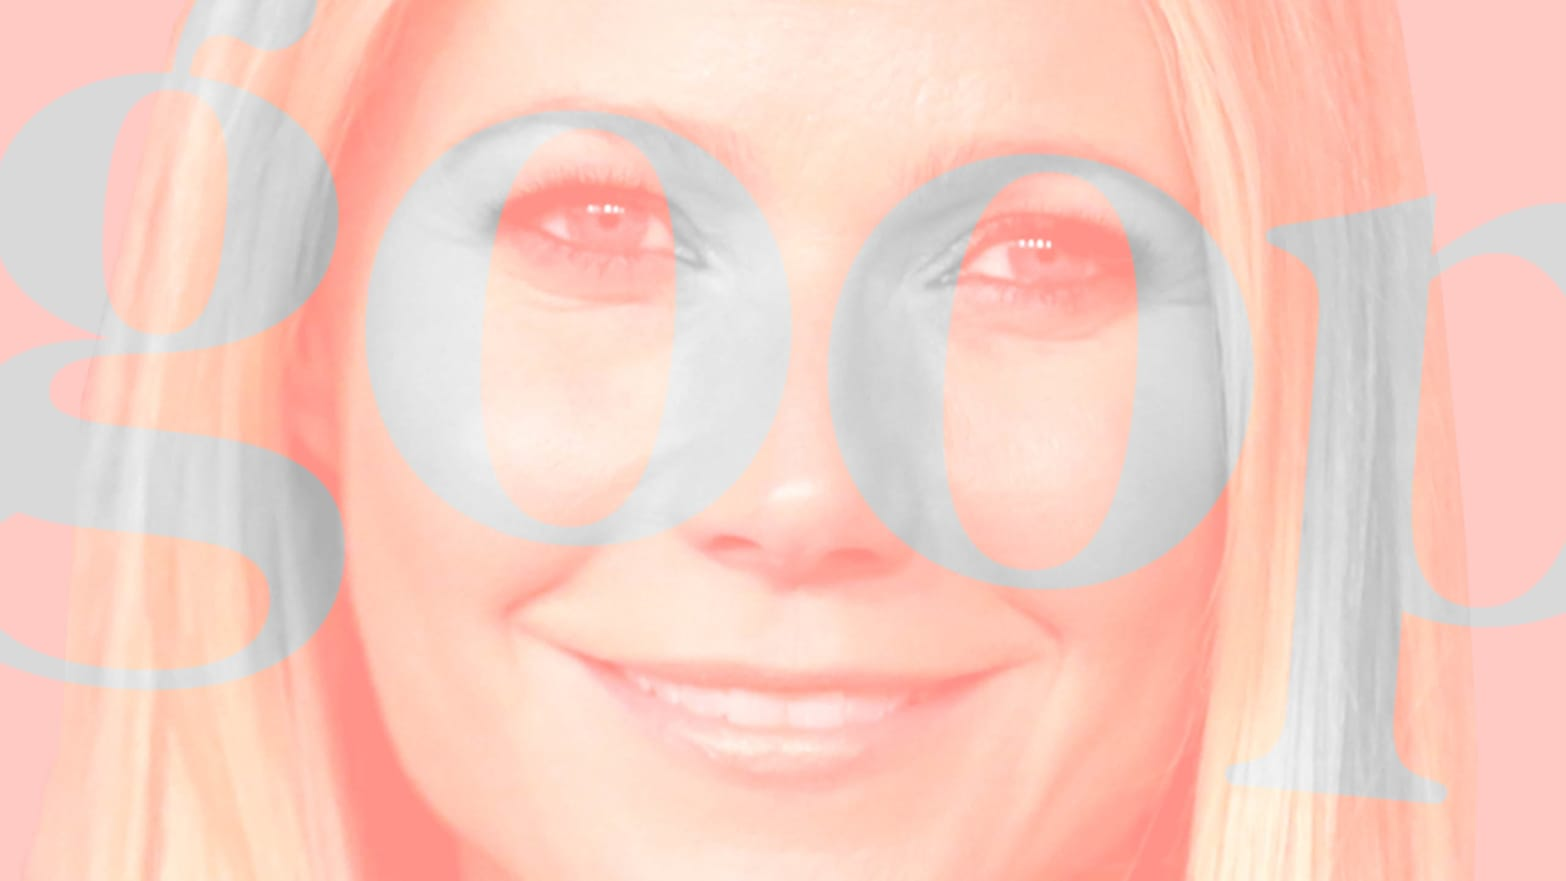 gwyneth paltrow in pink blurred and haze behind light blue pastel goop imprint netflix show timothy caulfield twitter pseudoscience